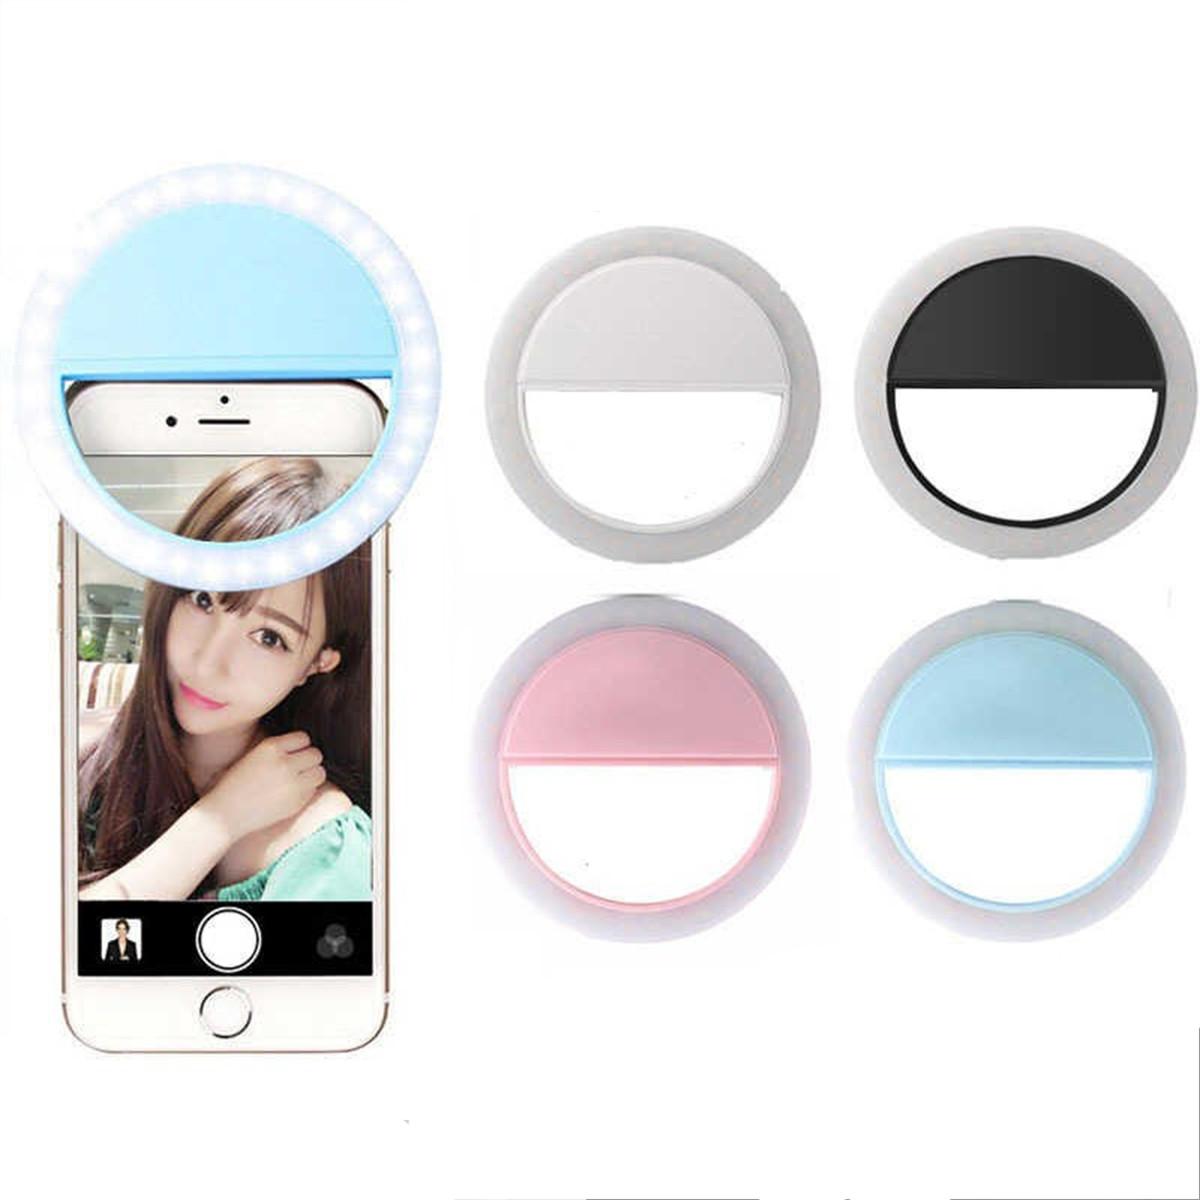 Кольцо для селфи на телефон Selfie Ring Light ЛЕД LED Лампа на Аккумуляторе RK-12 D=10 см